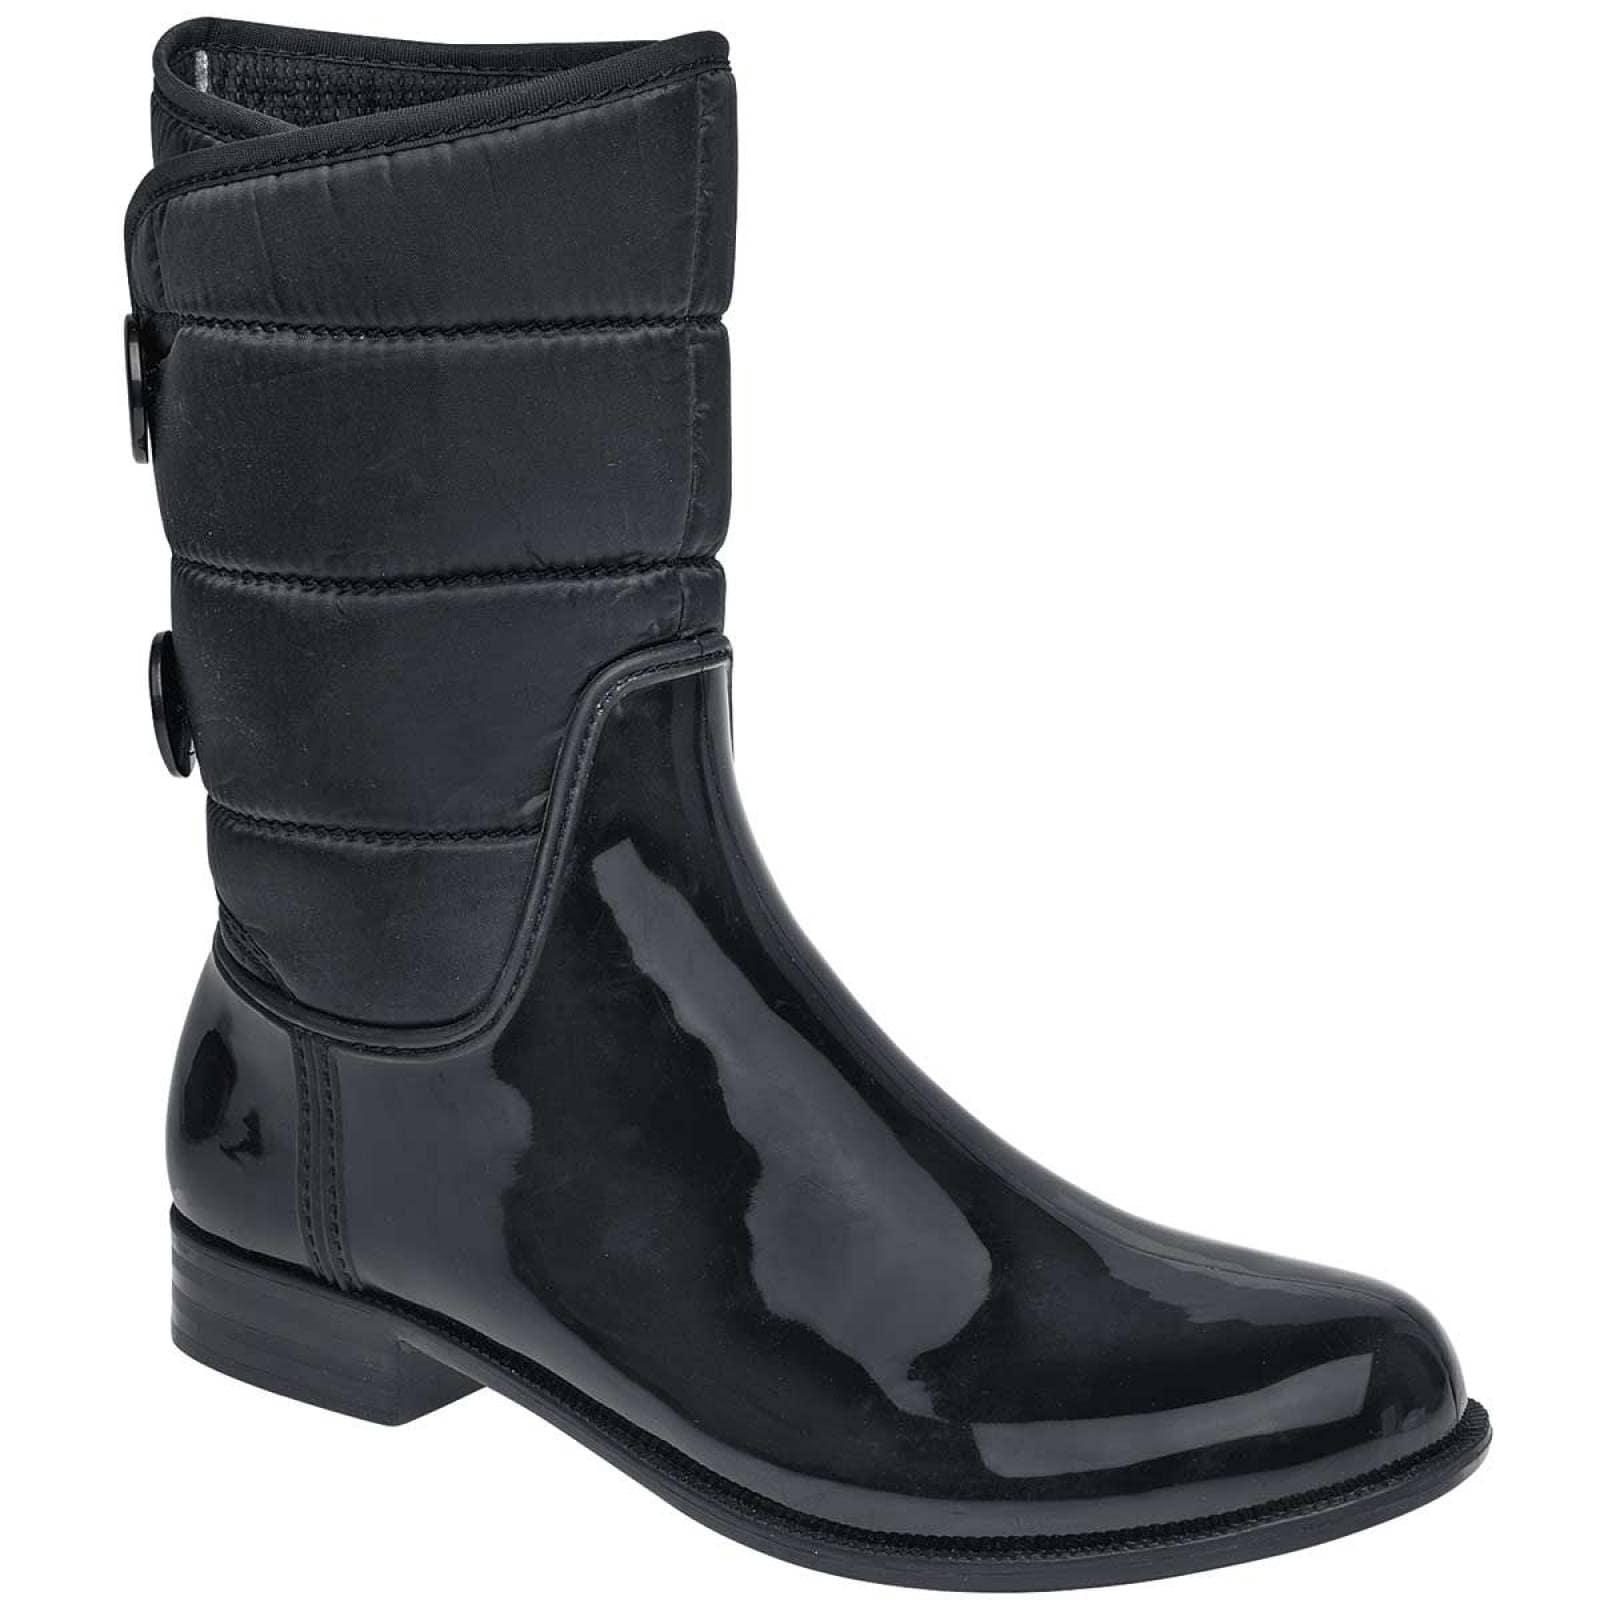 Elega Zapato Mujer Negro